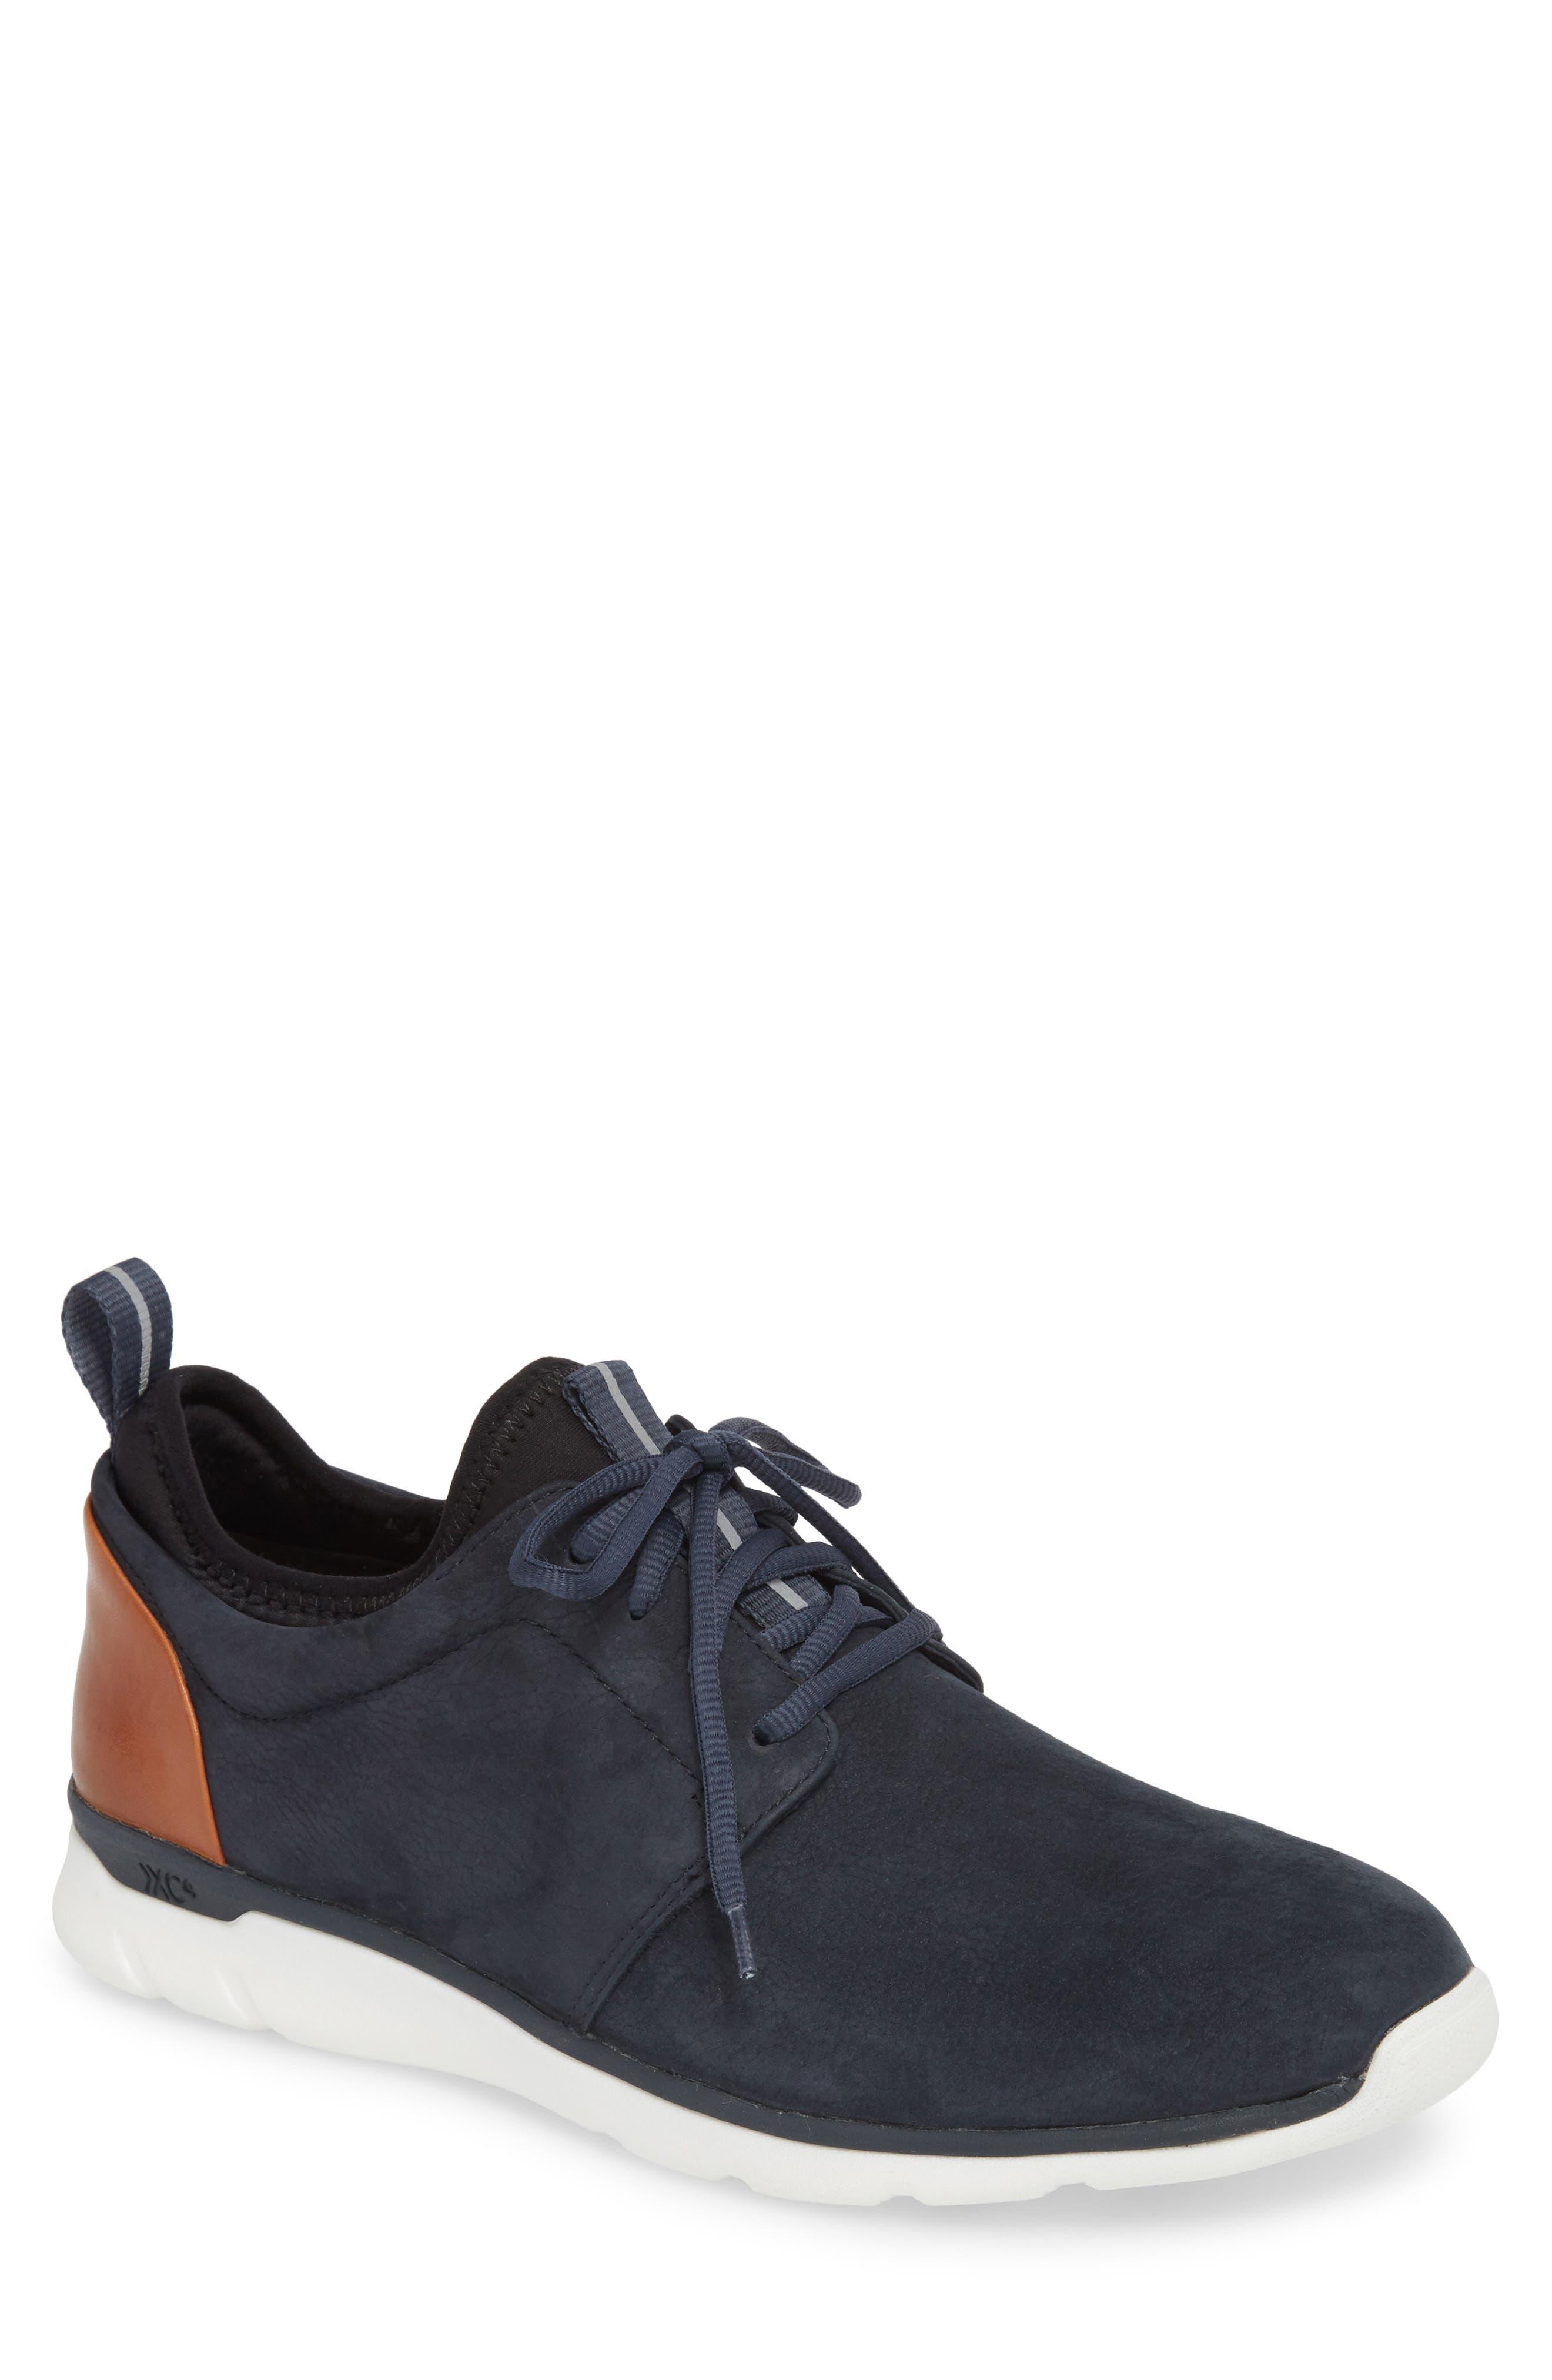 Prentiss XC4<sup>®</sup> Waterproof Low Top Sneaker,                             Main thumbnail 1, color,                             Navy Nubuck